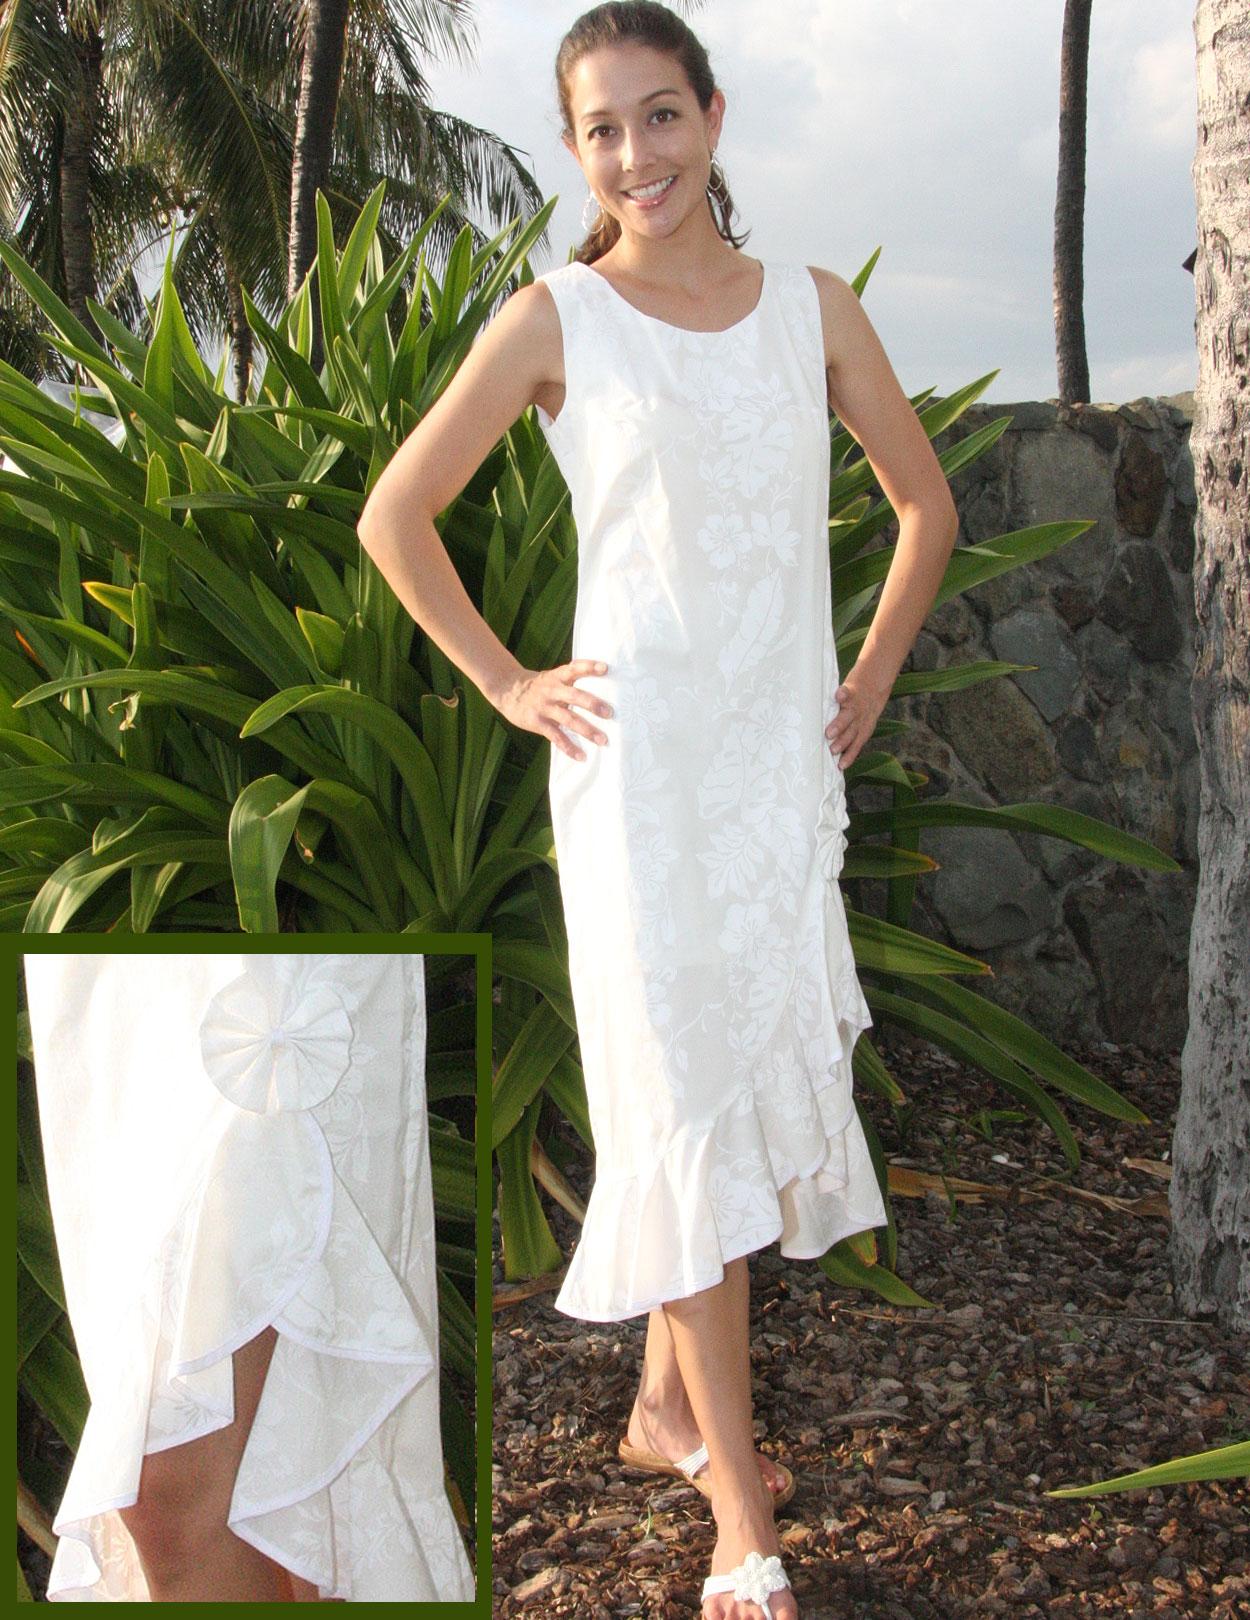 White Honolulu Wedding Tank Strap Mid Length Dress: Shaka ...